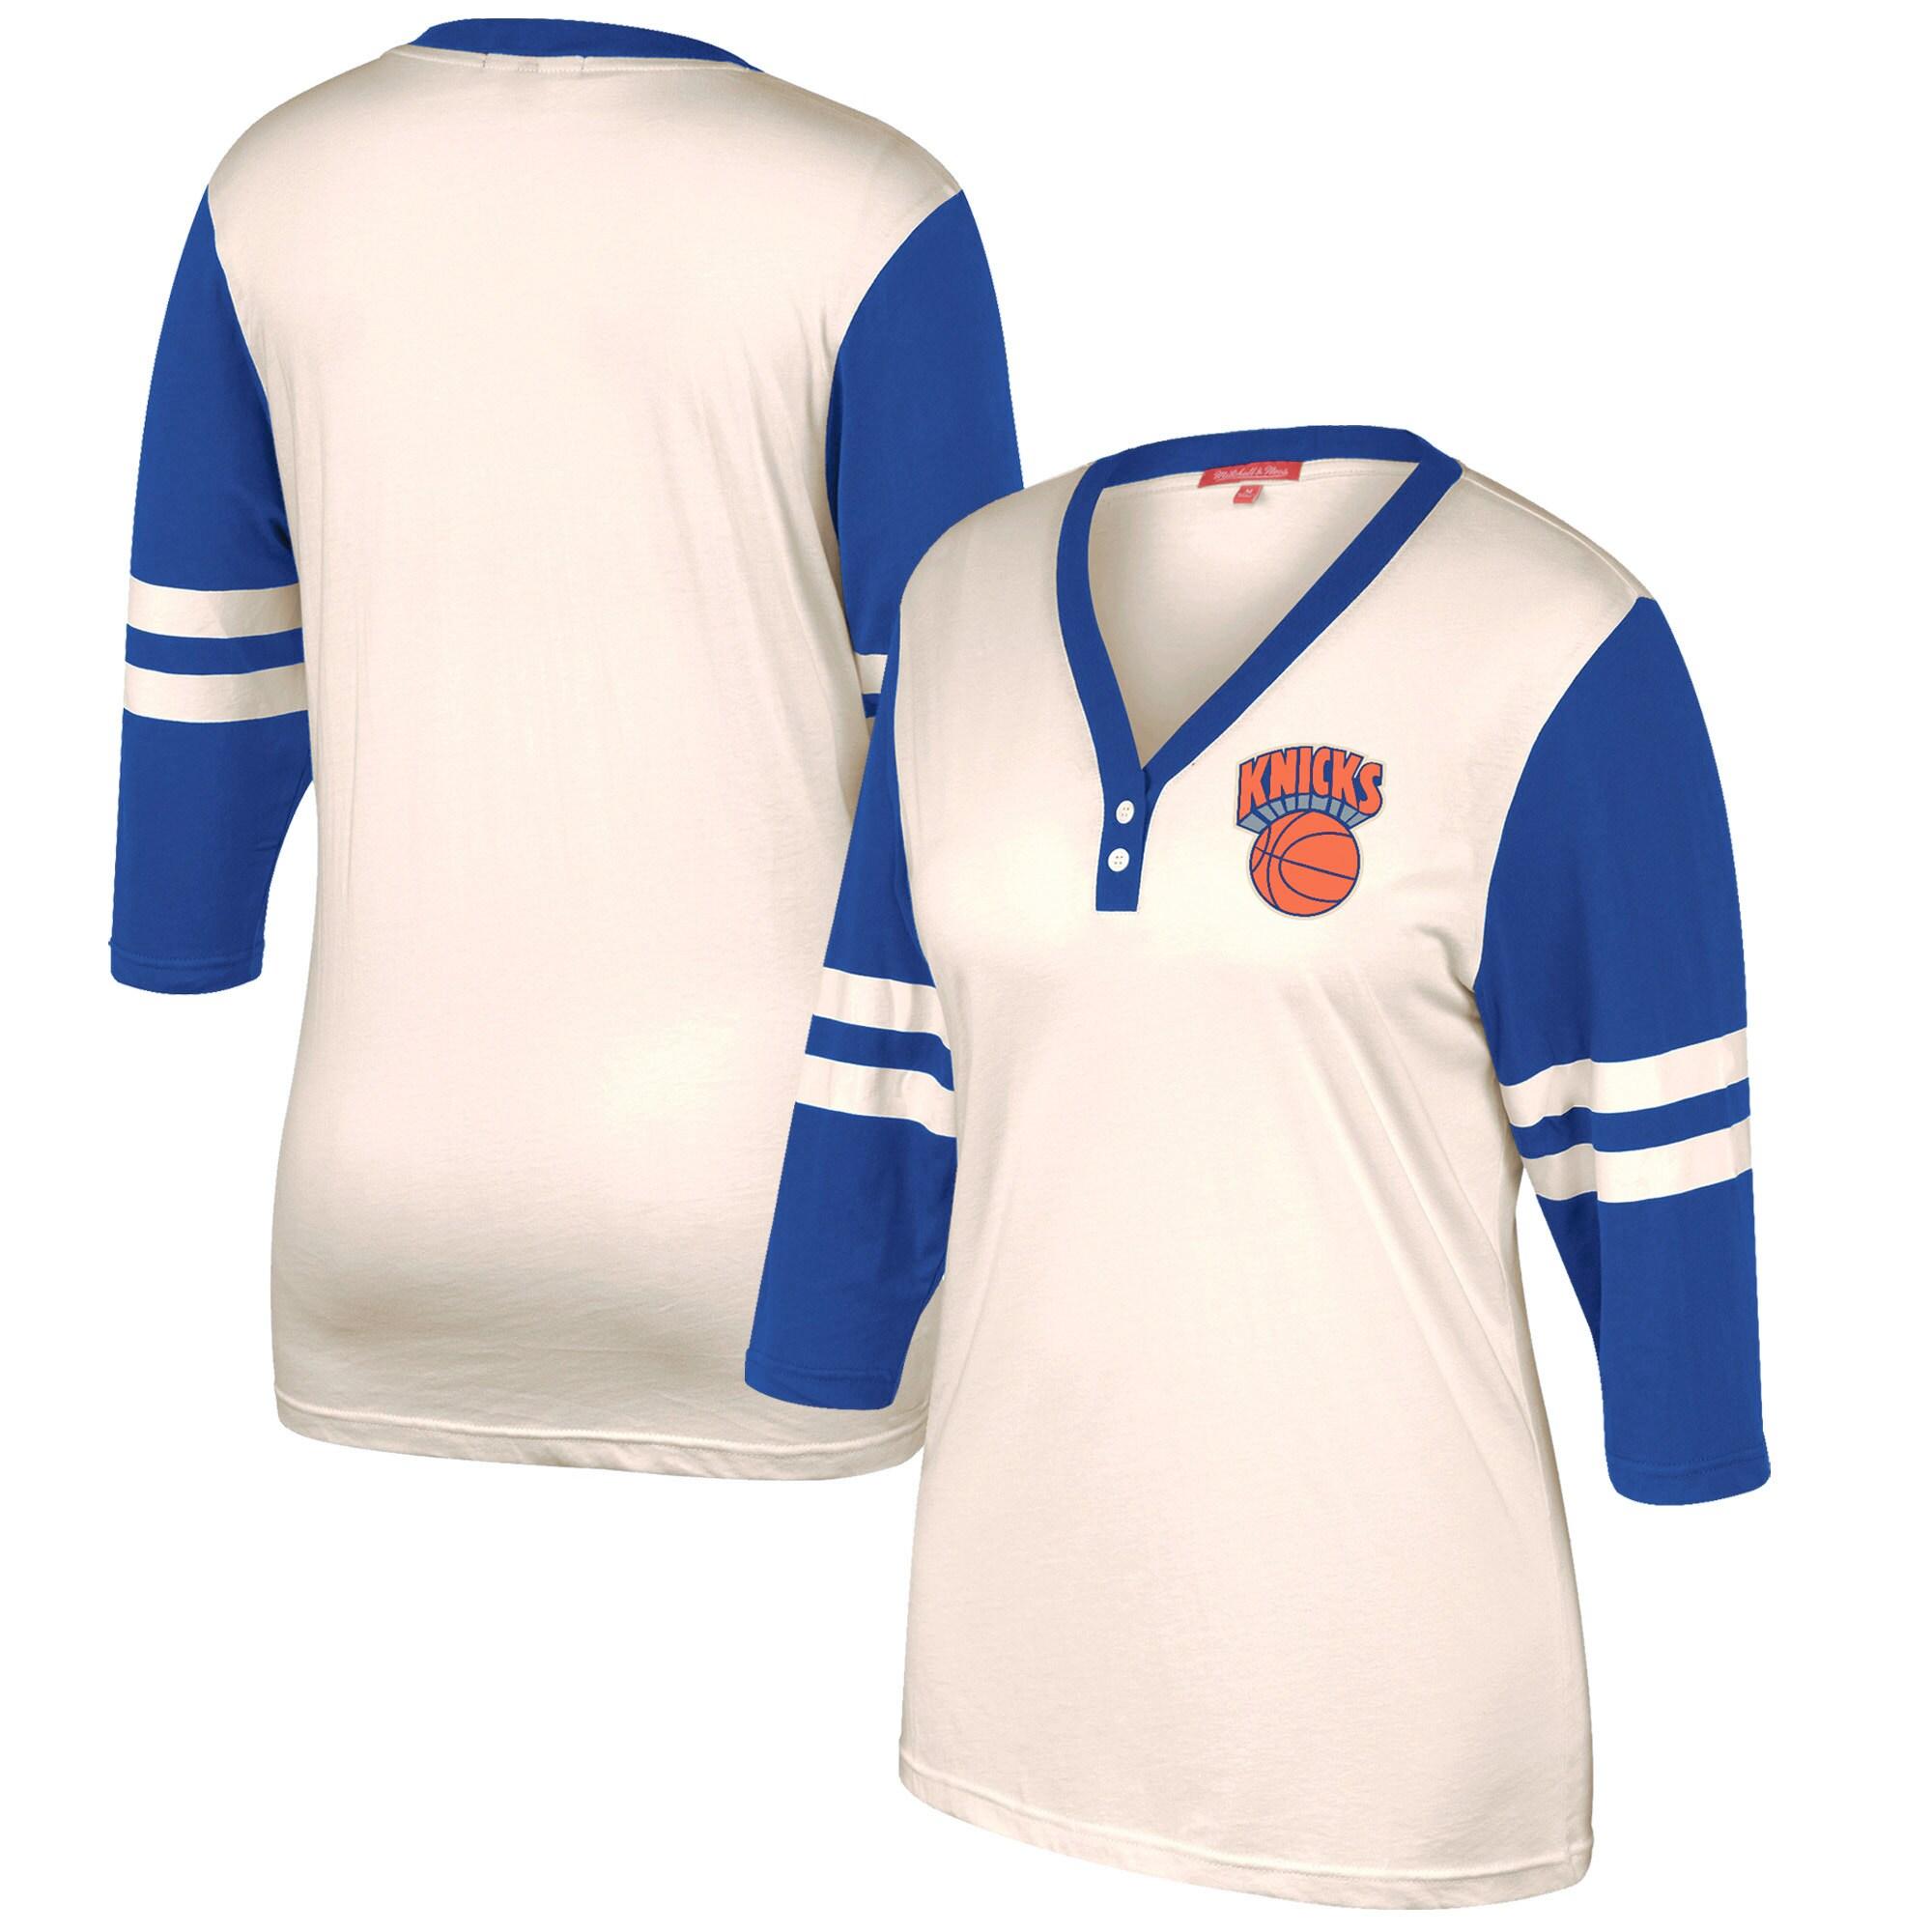 New York Knicks Mitchell & Ness Women's Shoot Out V-Neck 3/4 Sleeve T-Shirt - Cream